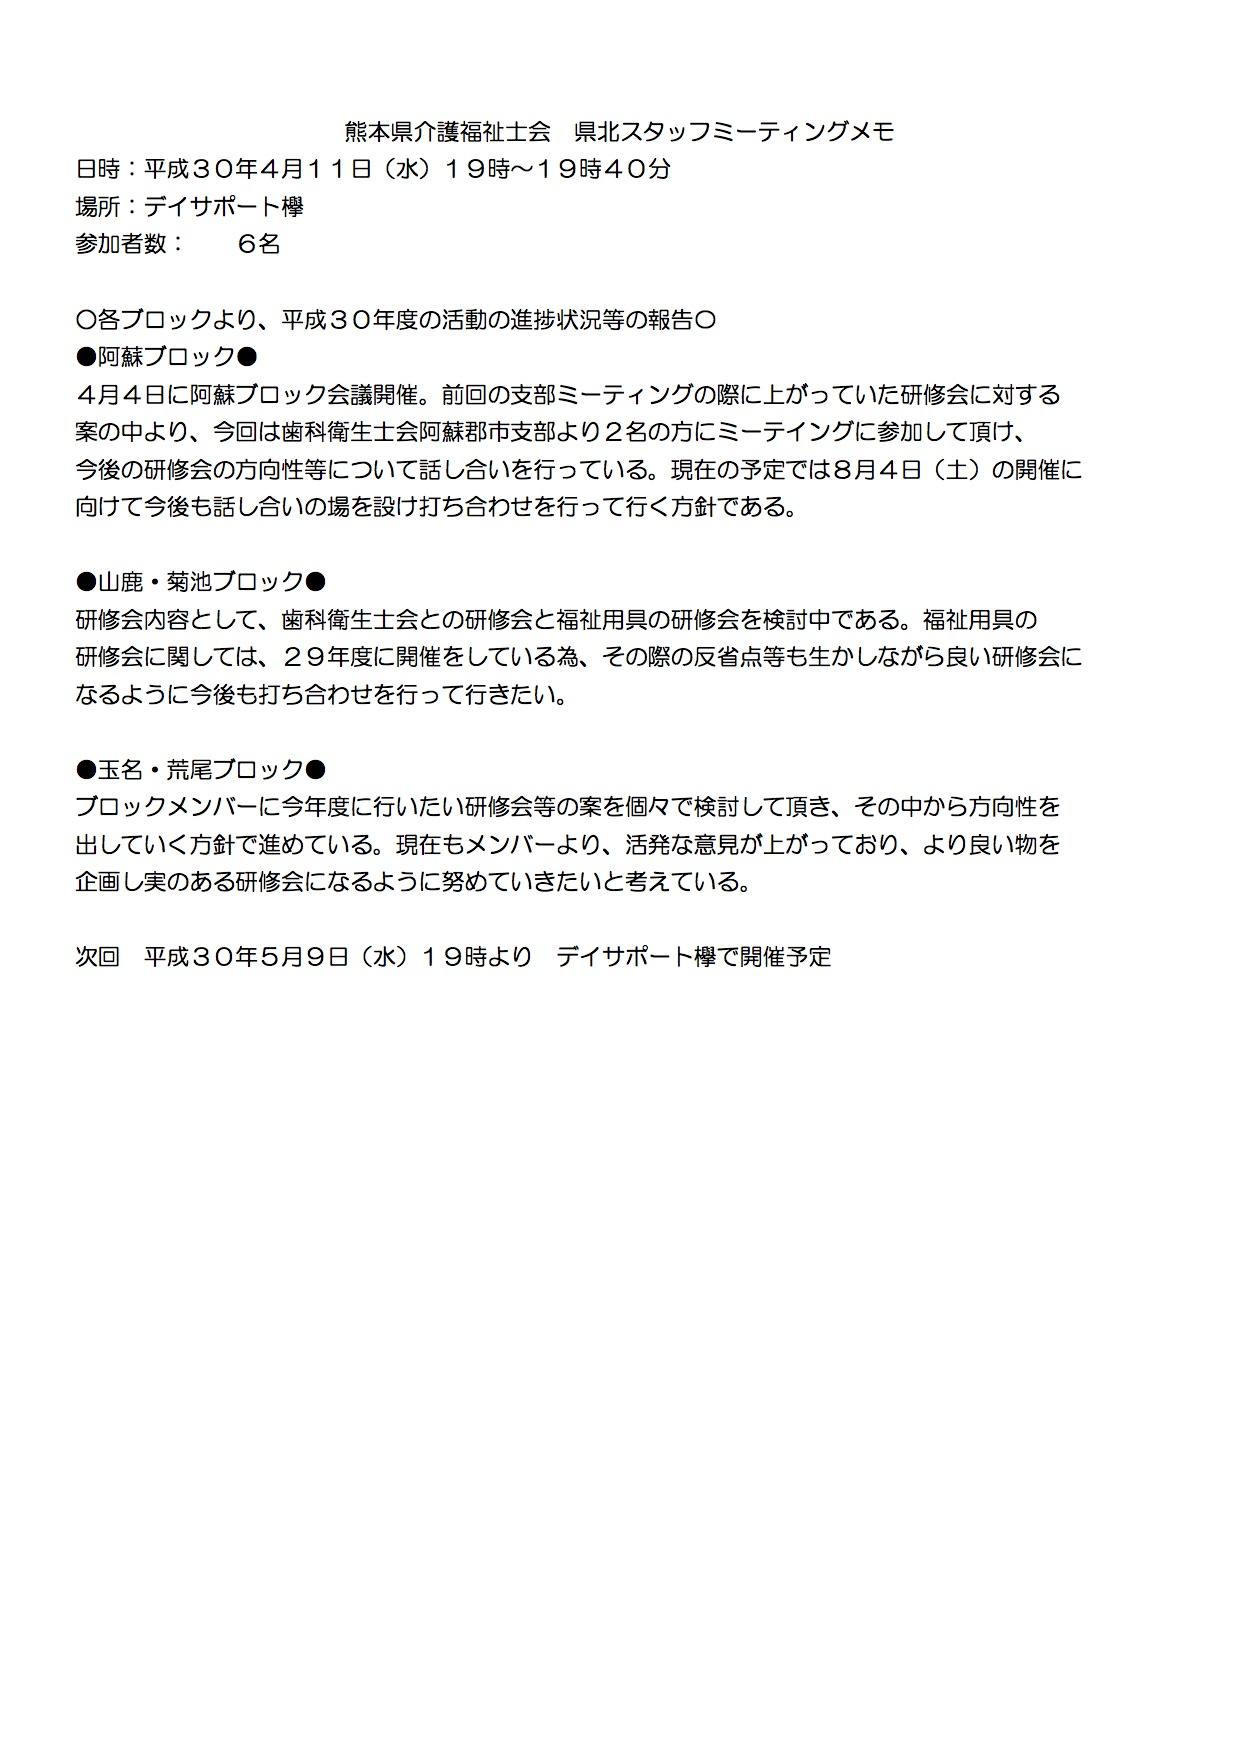 H30.4月11日県北スタッフミーティングメモ